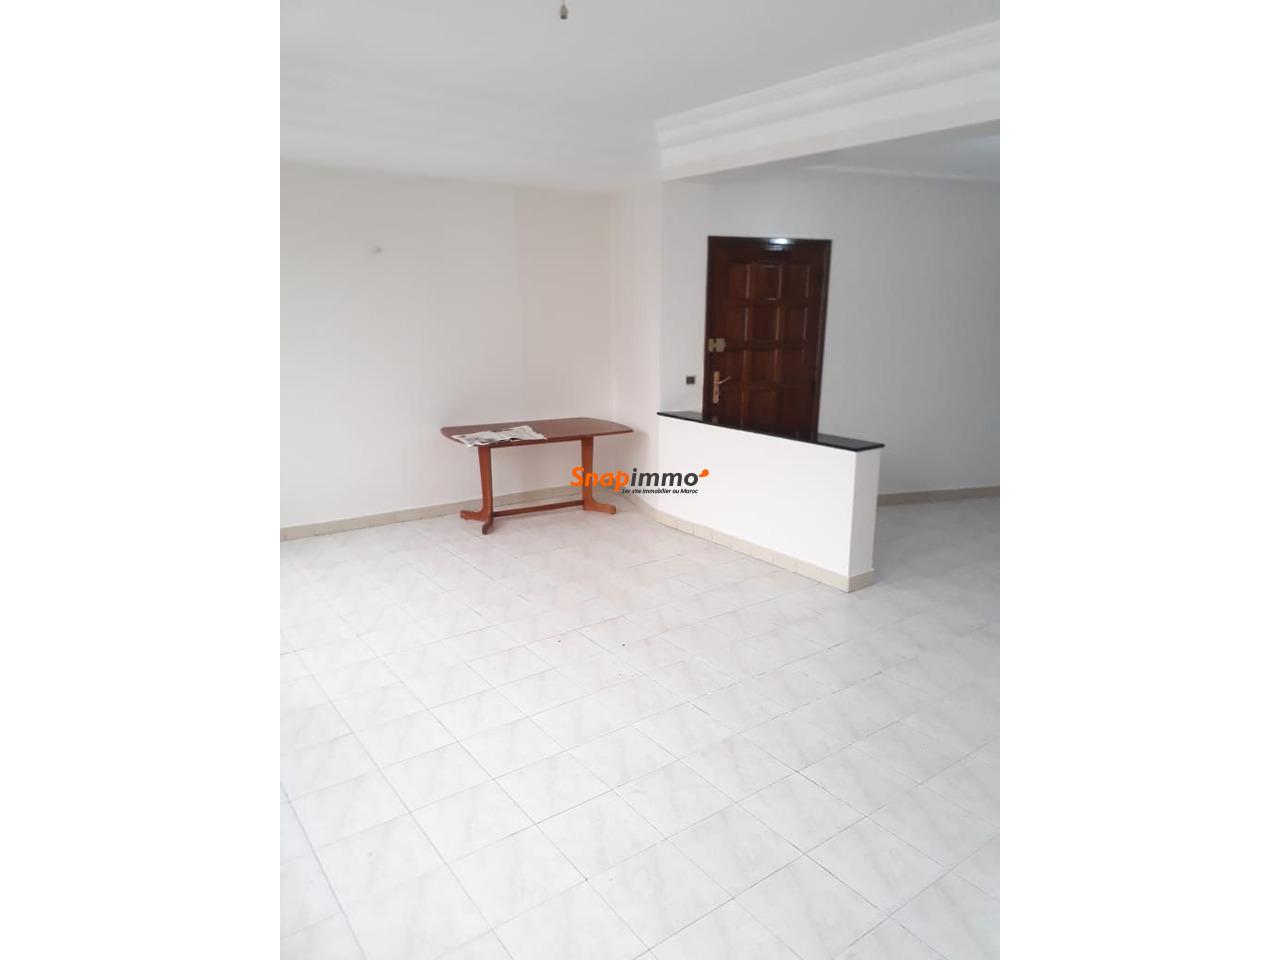 Appartement 2 mars a vendre - 1/6